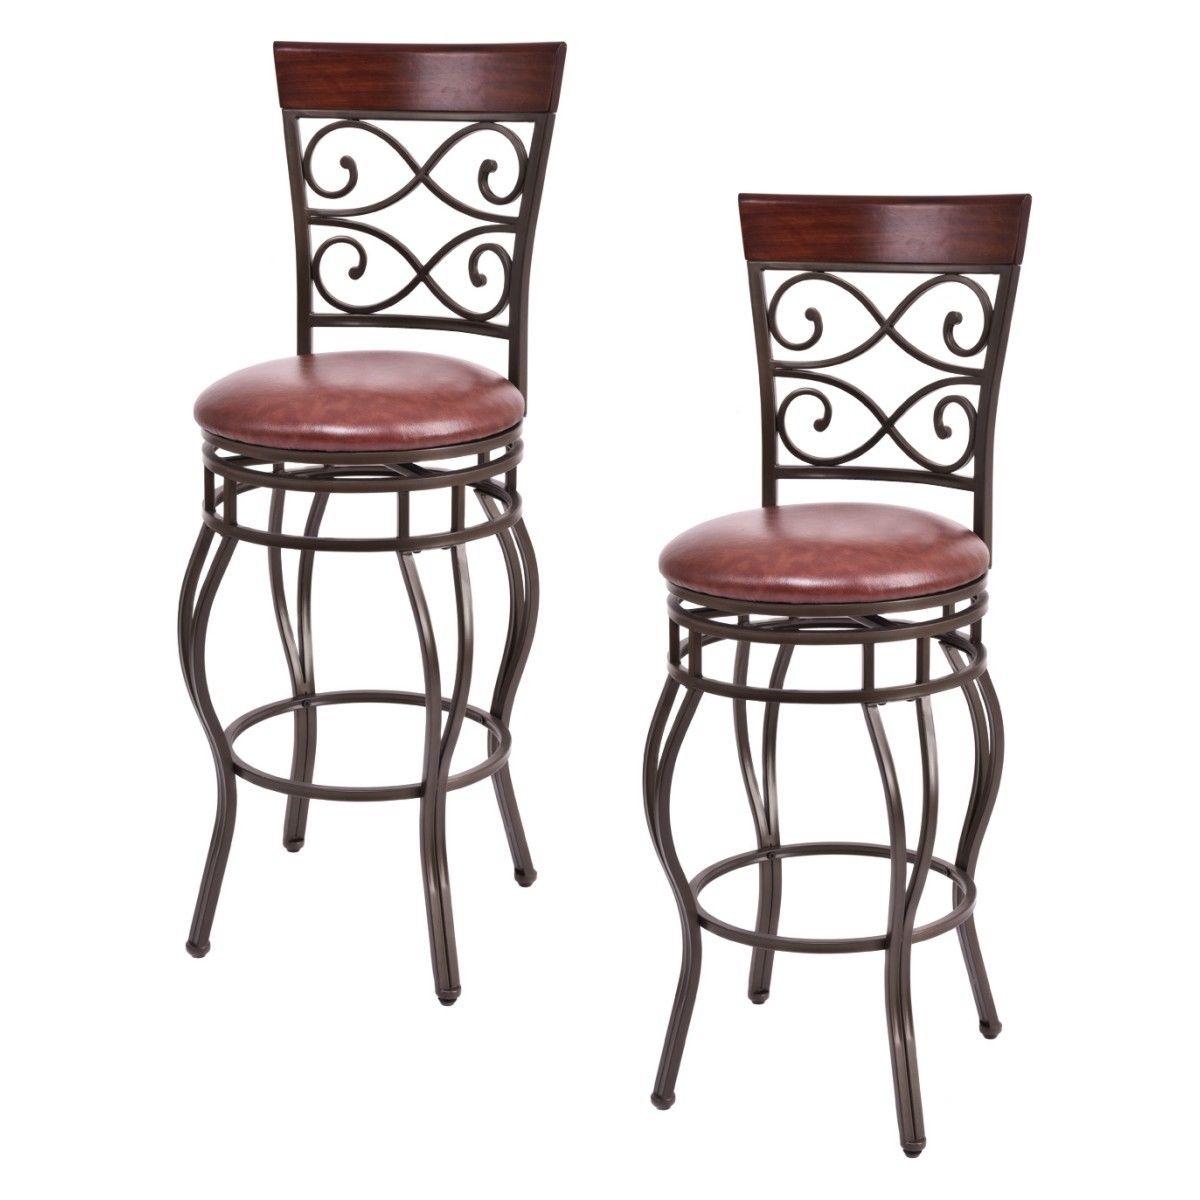 Set Of 2 Vintage Bar Stools Swivel Padded Seat Bistro Dining Kitchen Pub Chair